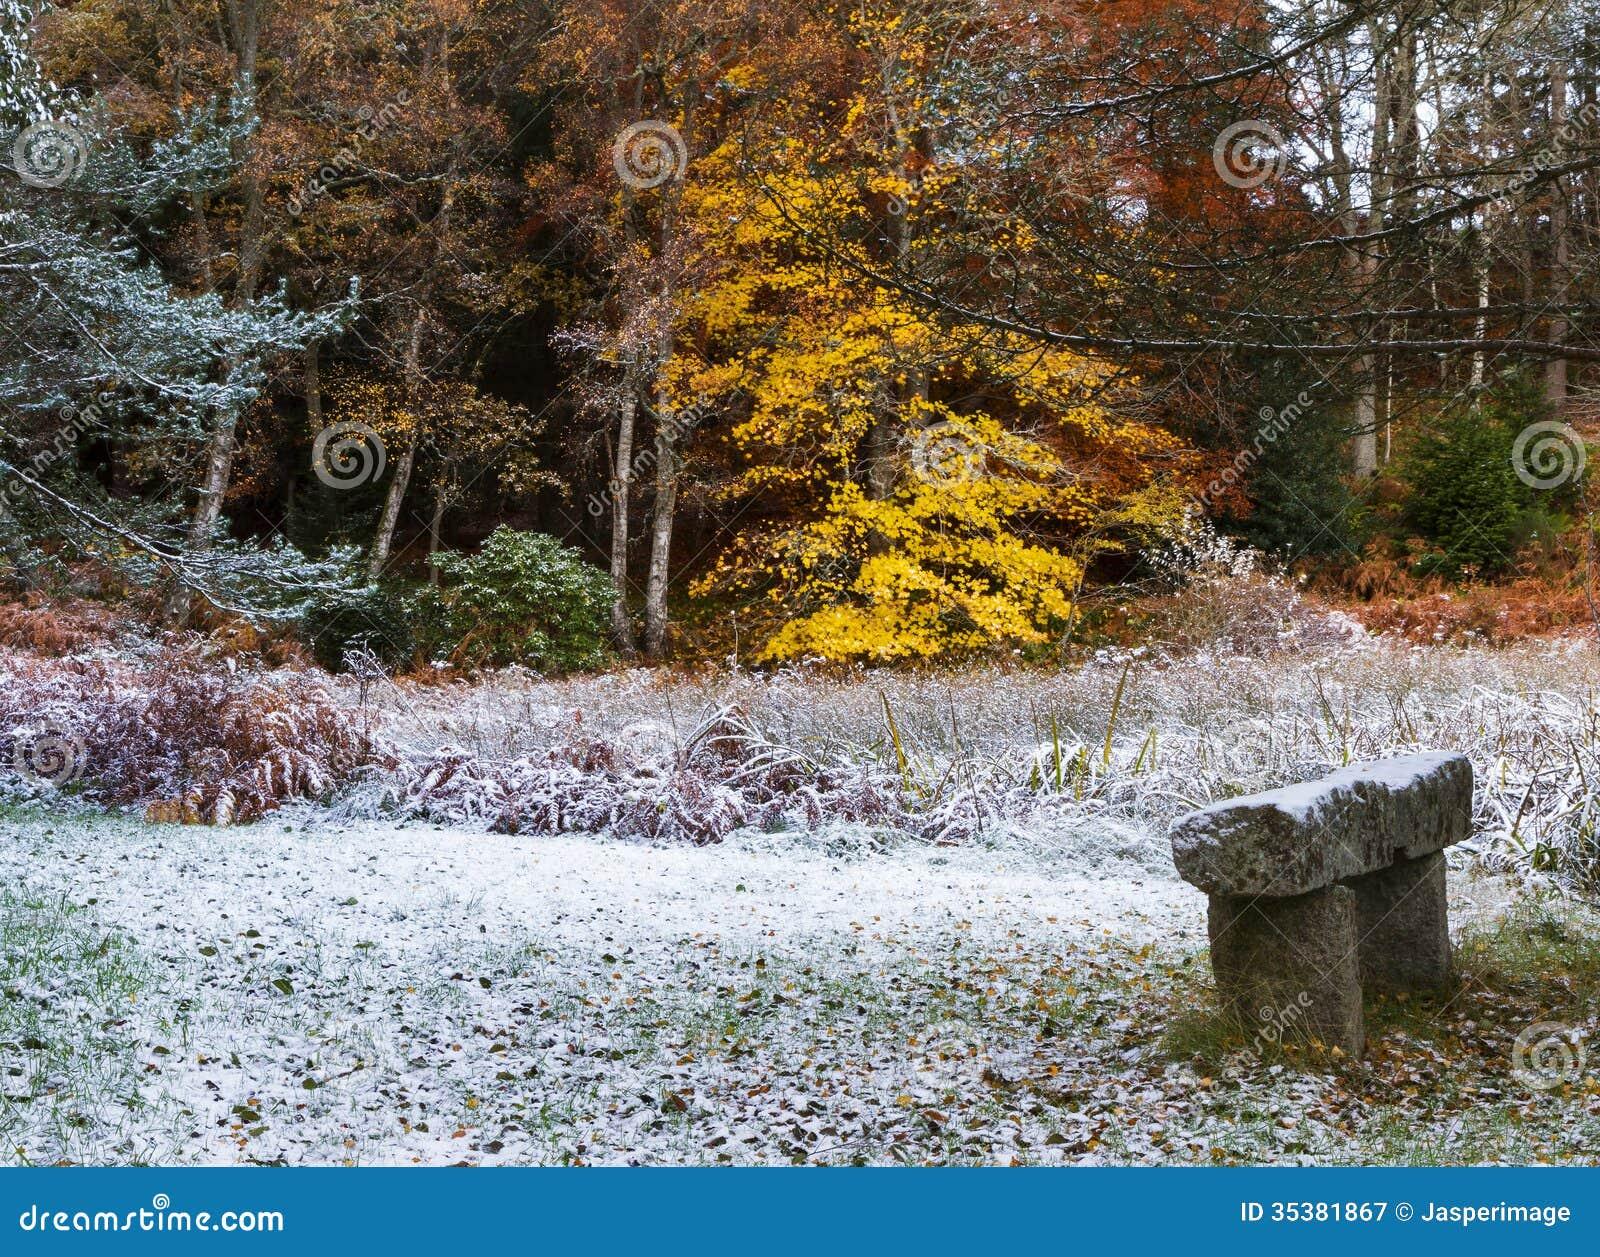 Teste rank C - Anne' Moray-winter-garden-first-snow-november-speyside-scotland-united-kingdom-35381867